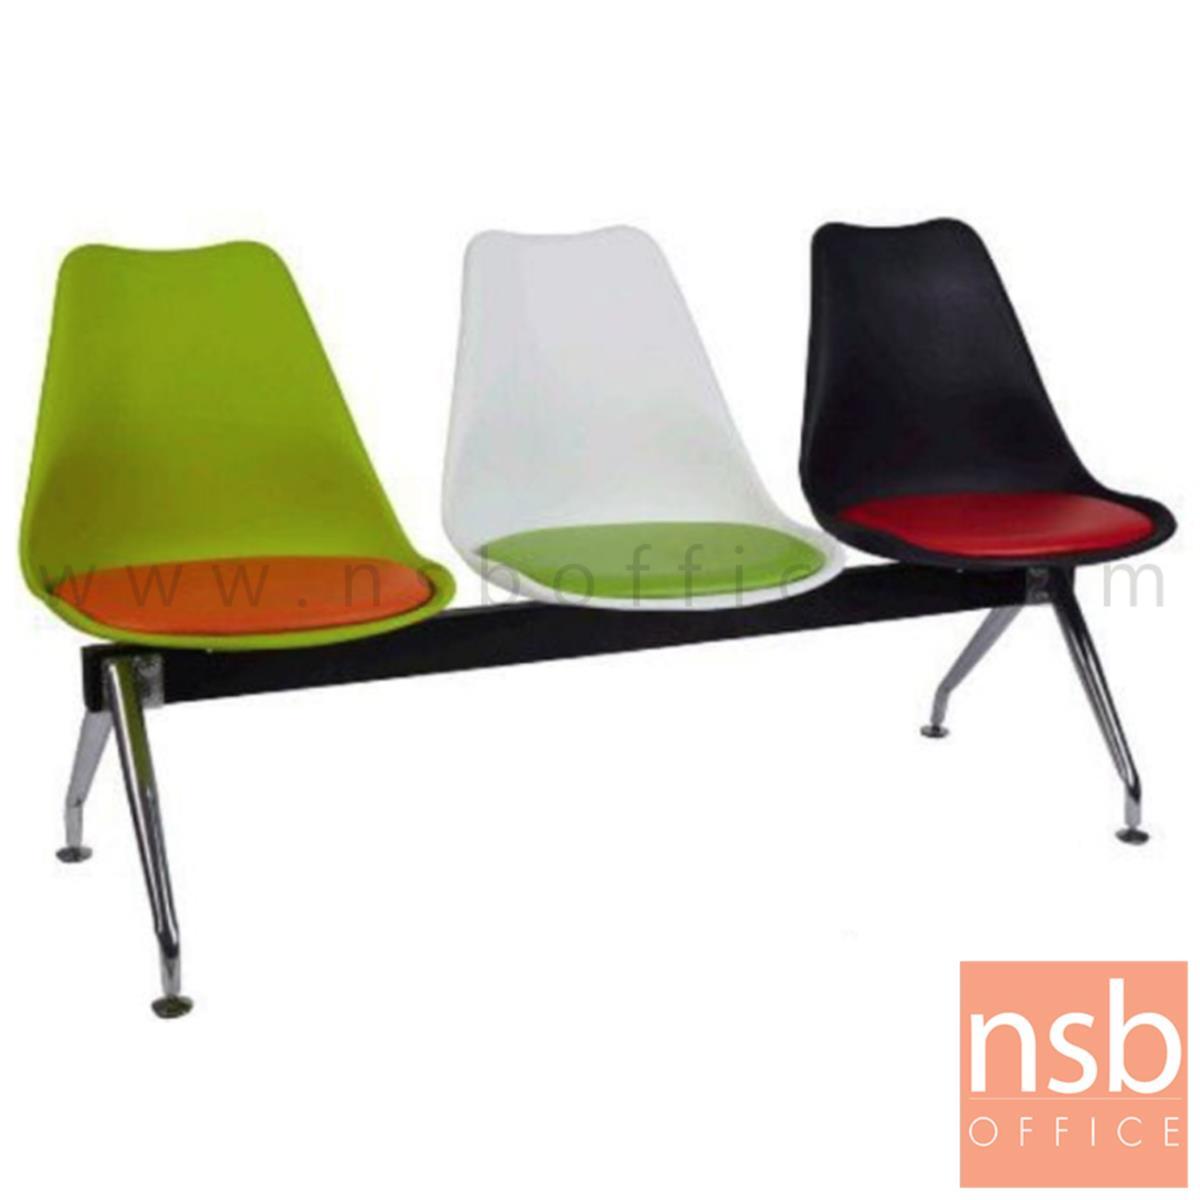 B06A154:เก้าอี้นั่งคอยเฟรมโพลี่หุ้มเบาะ รุ่น Alfred (อัลเฟรด) 2, 3, 4 ที่นั่ง ขาเหล็ก